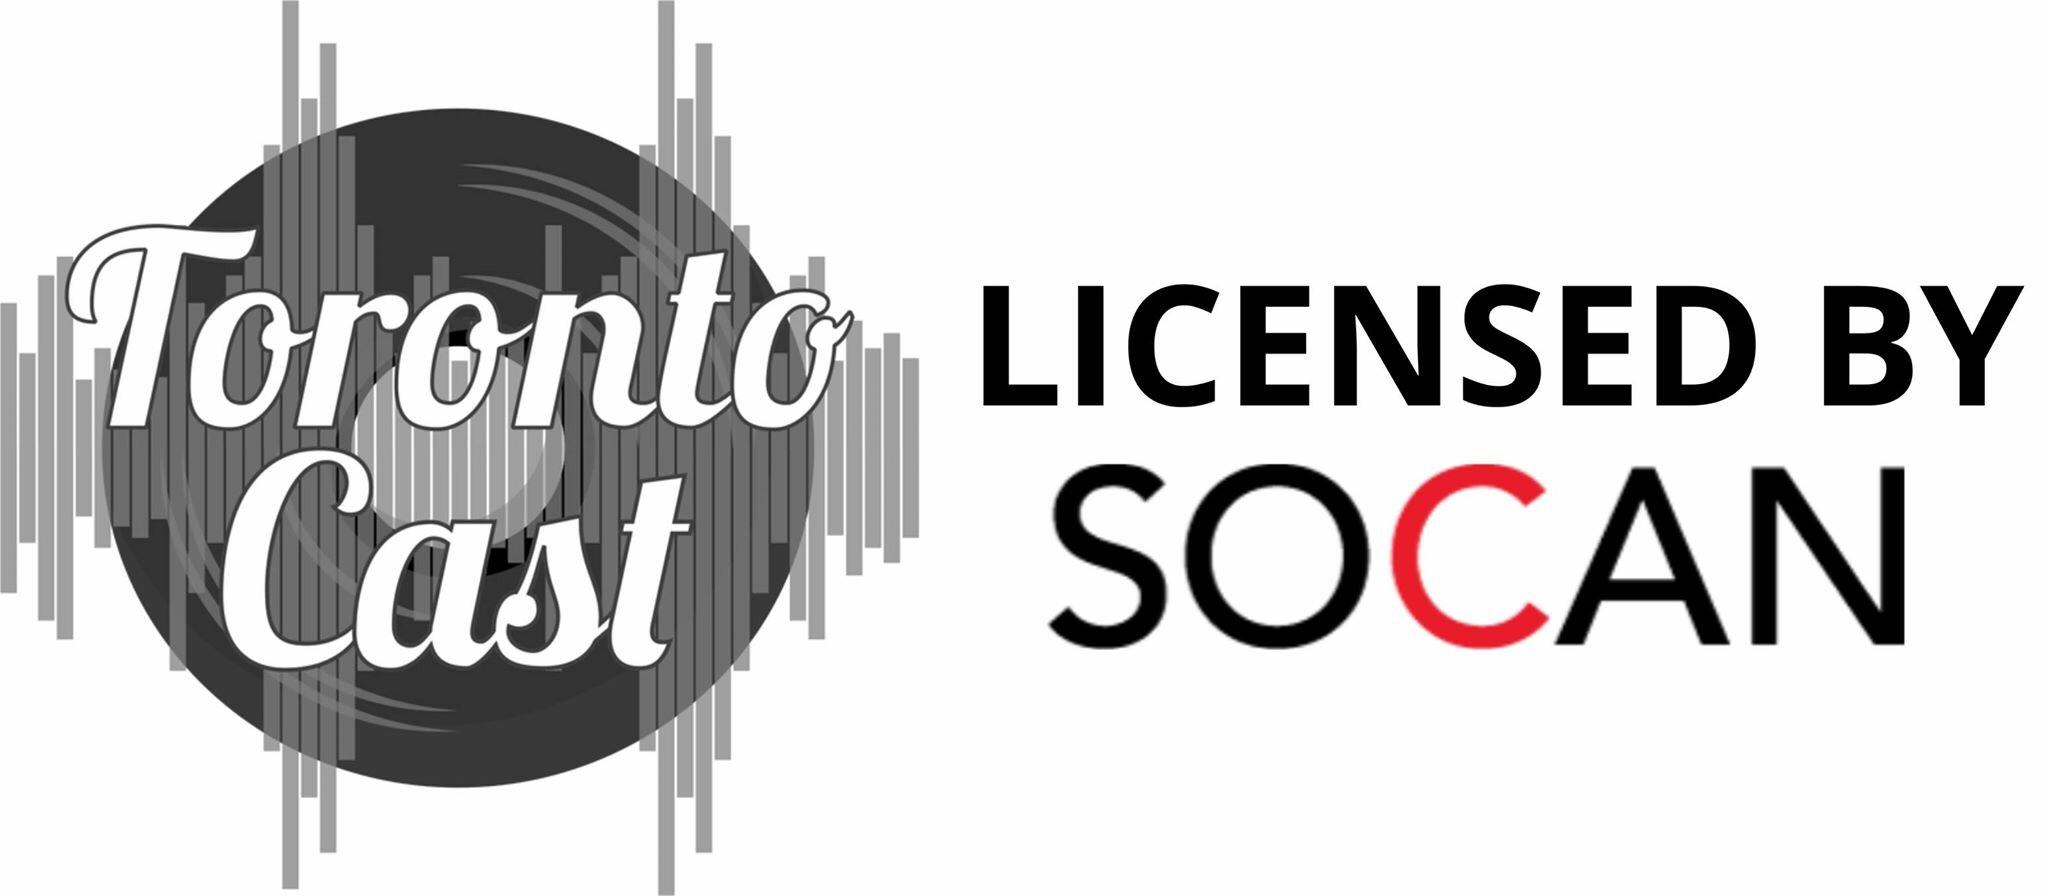 TorontoCast - Socan License